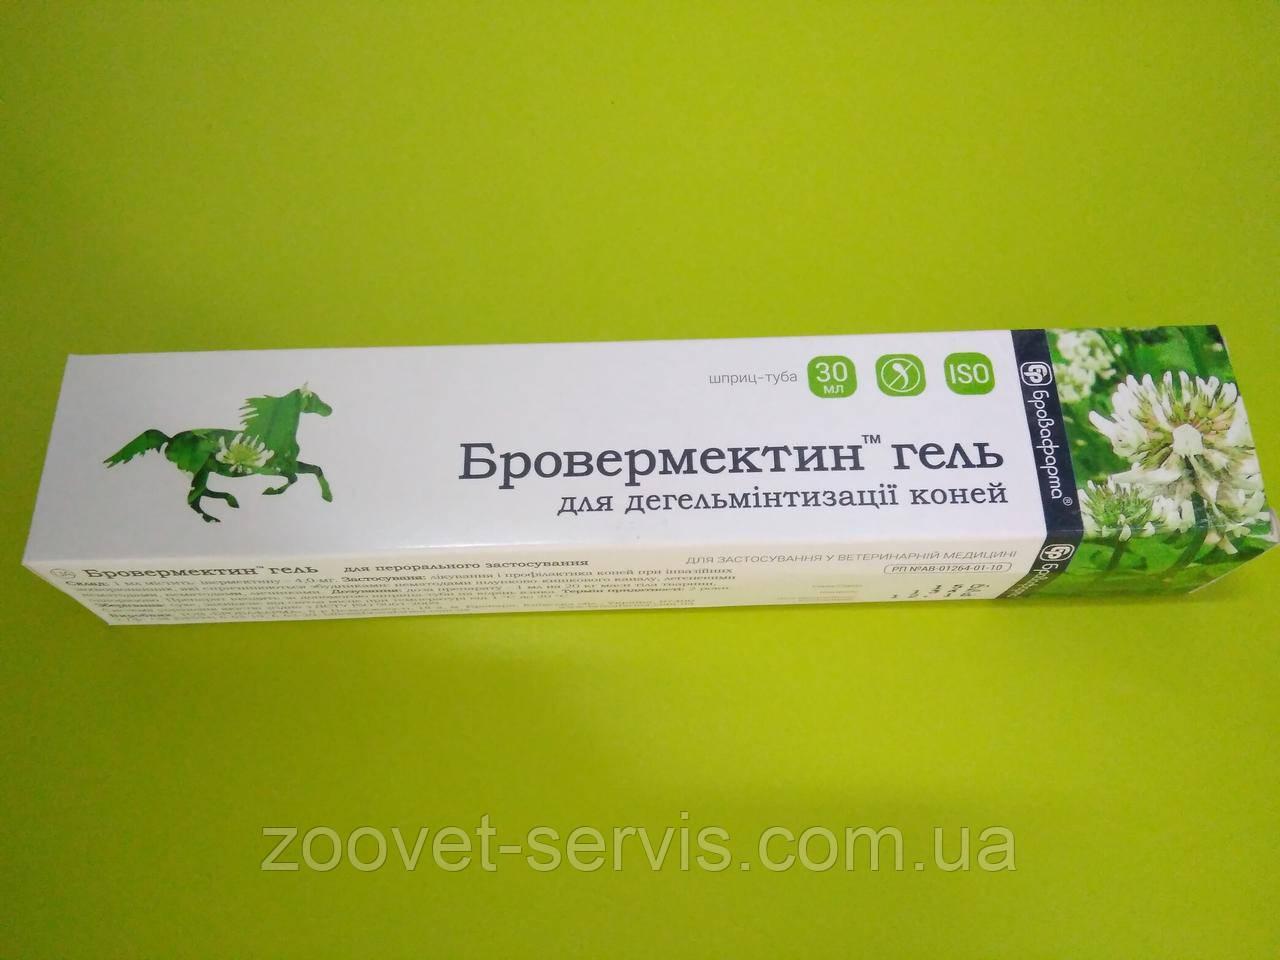 Бровермектин гель шприц - 30 мл